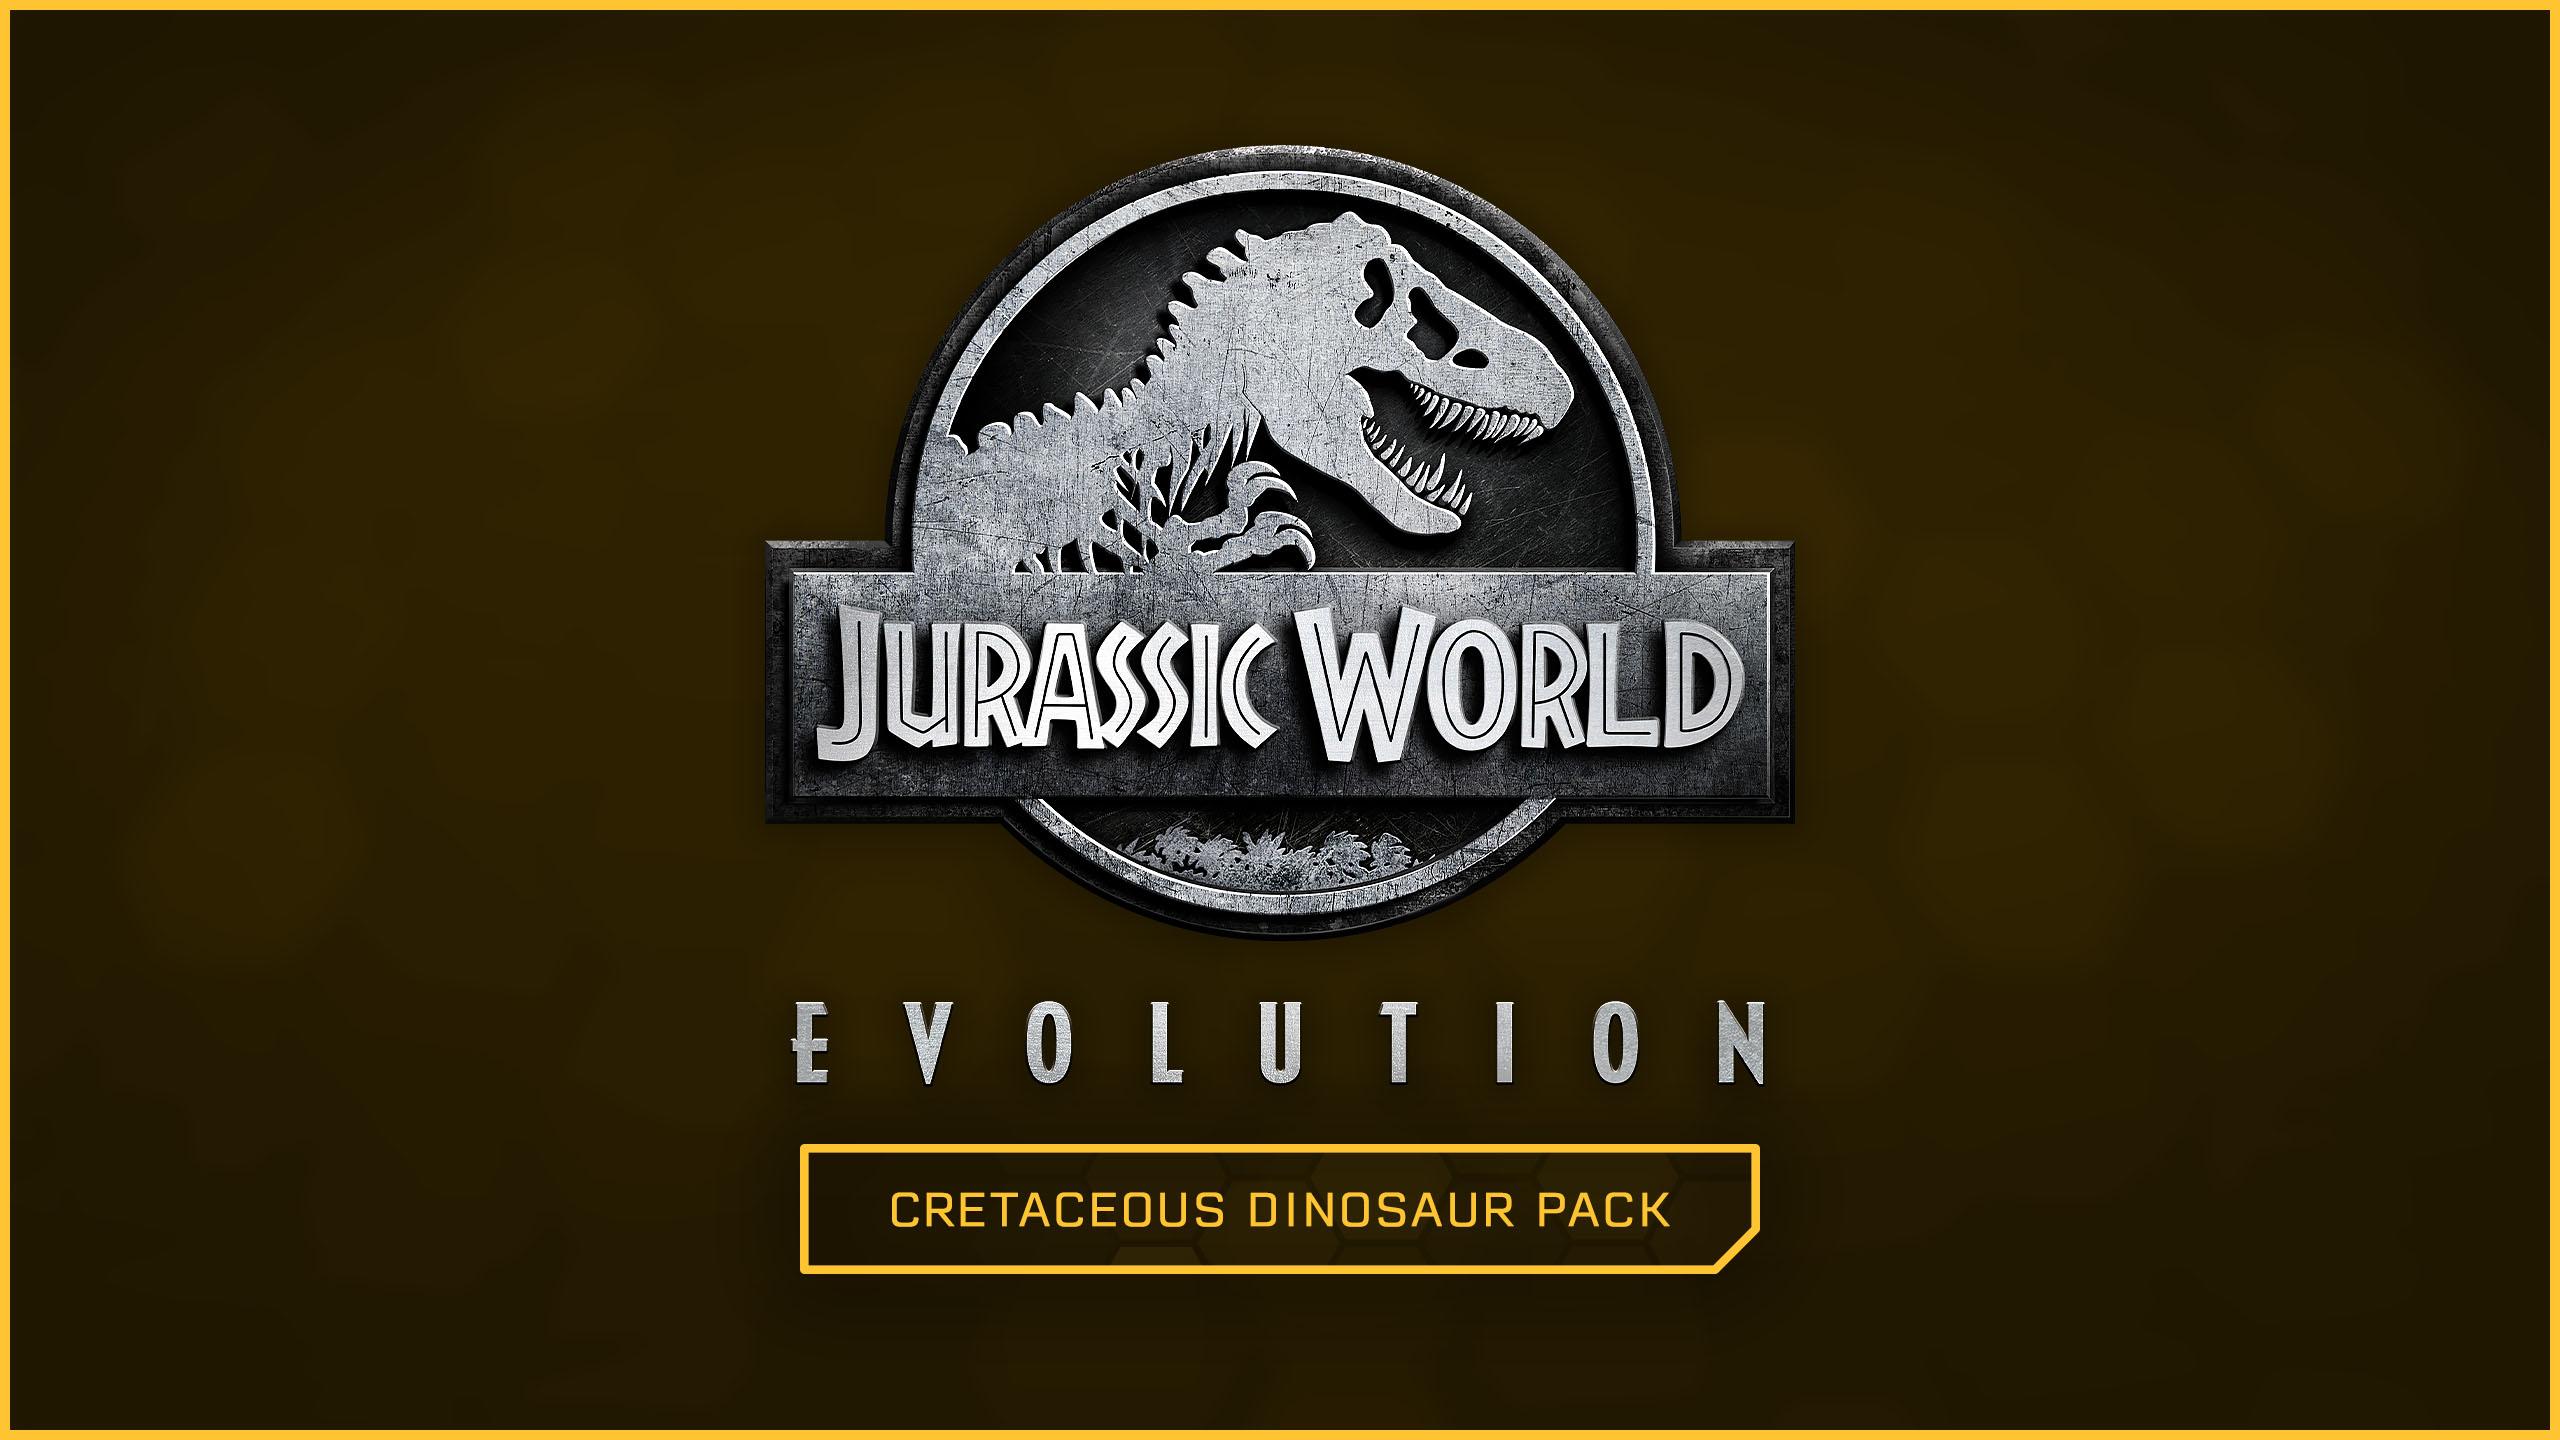 Jurassic World Evolution Cretaceous Dinosaur Pack